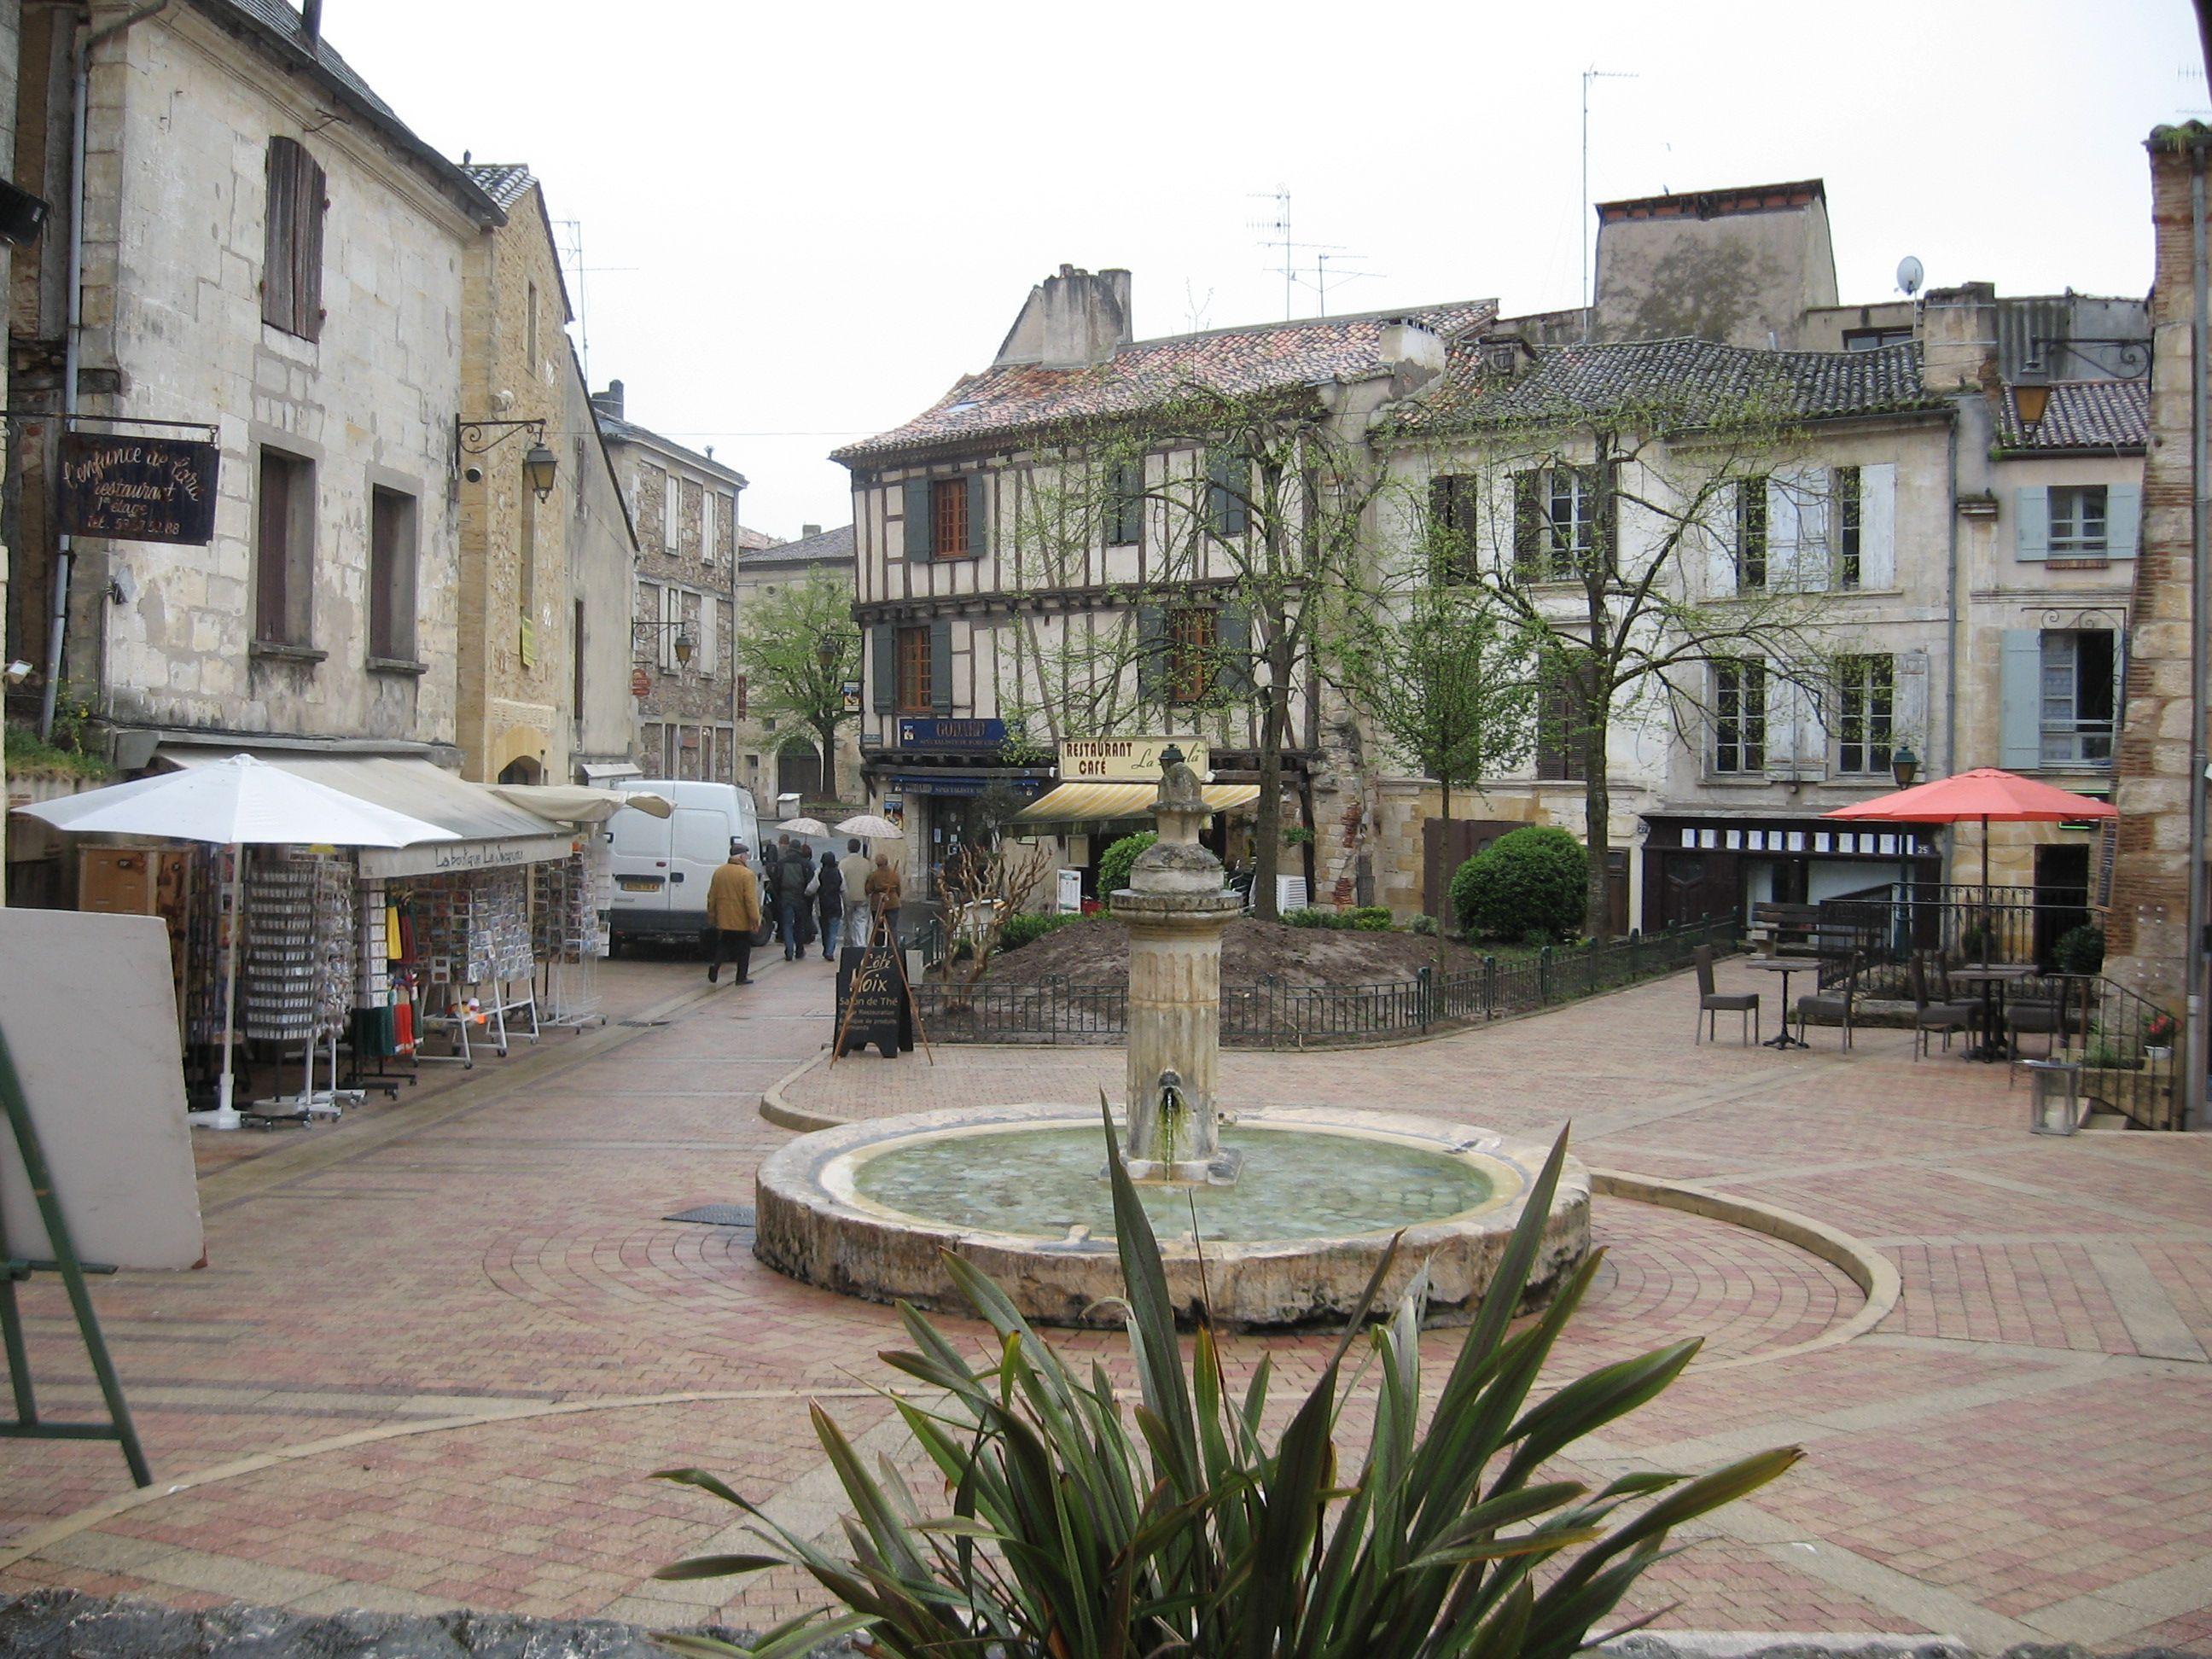 Fontaine, Village Cerano de Bergerac, France, printemps 2007